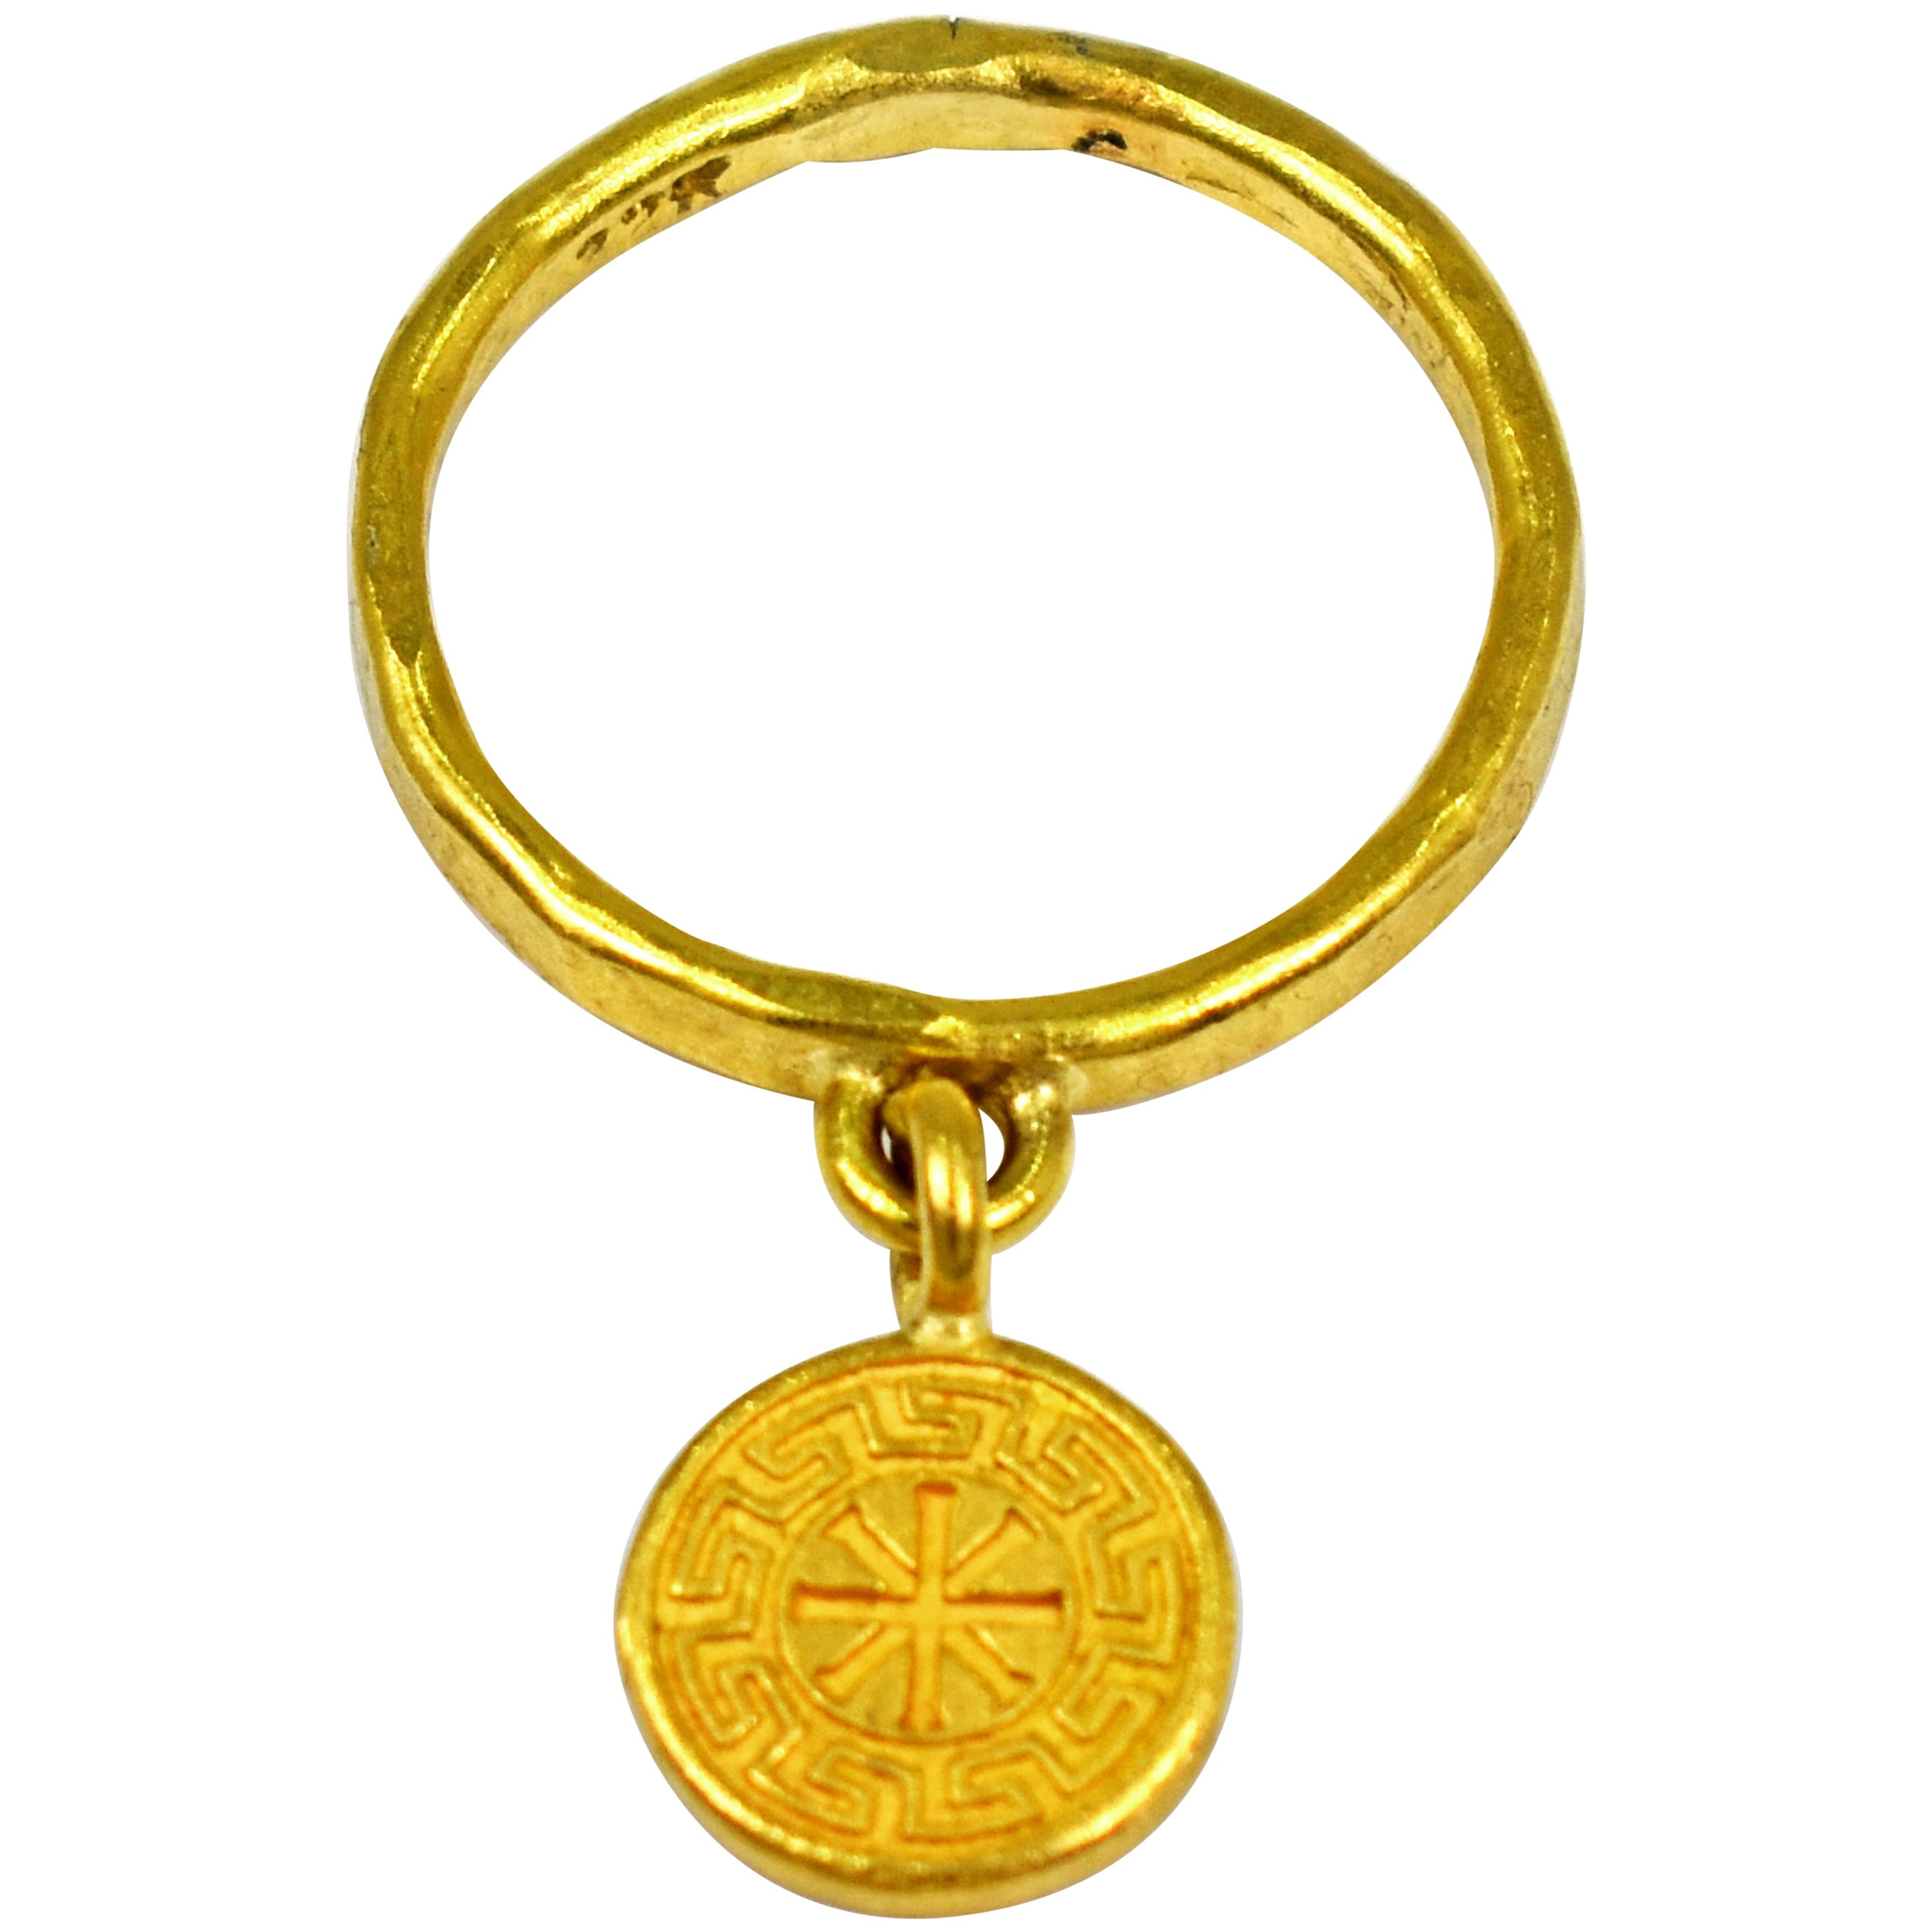 22 Karat Gold Ixthus Charm Ring Band